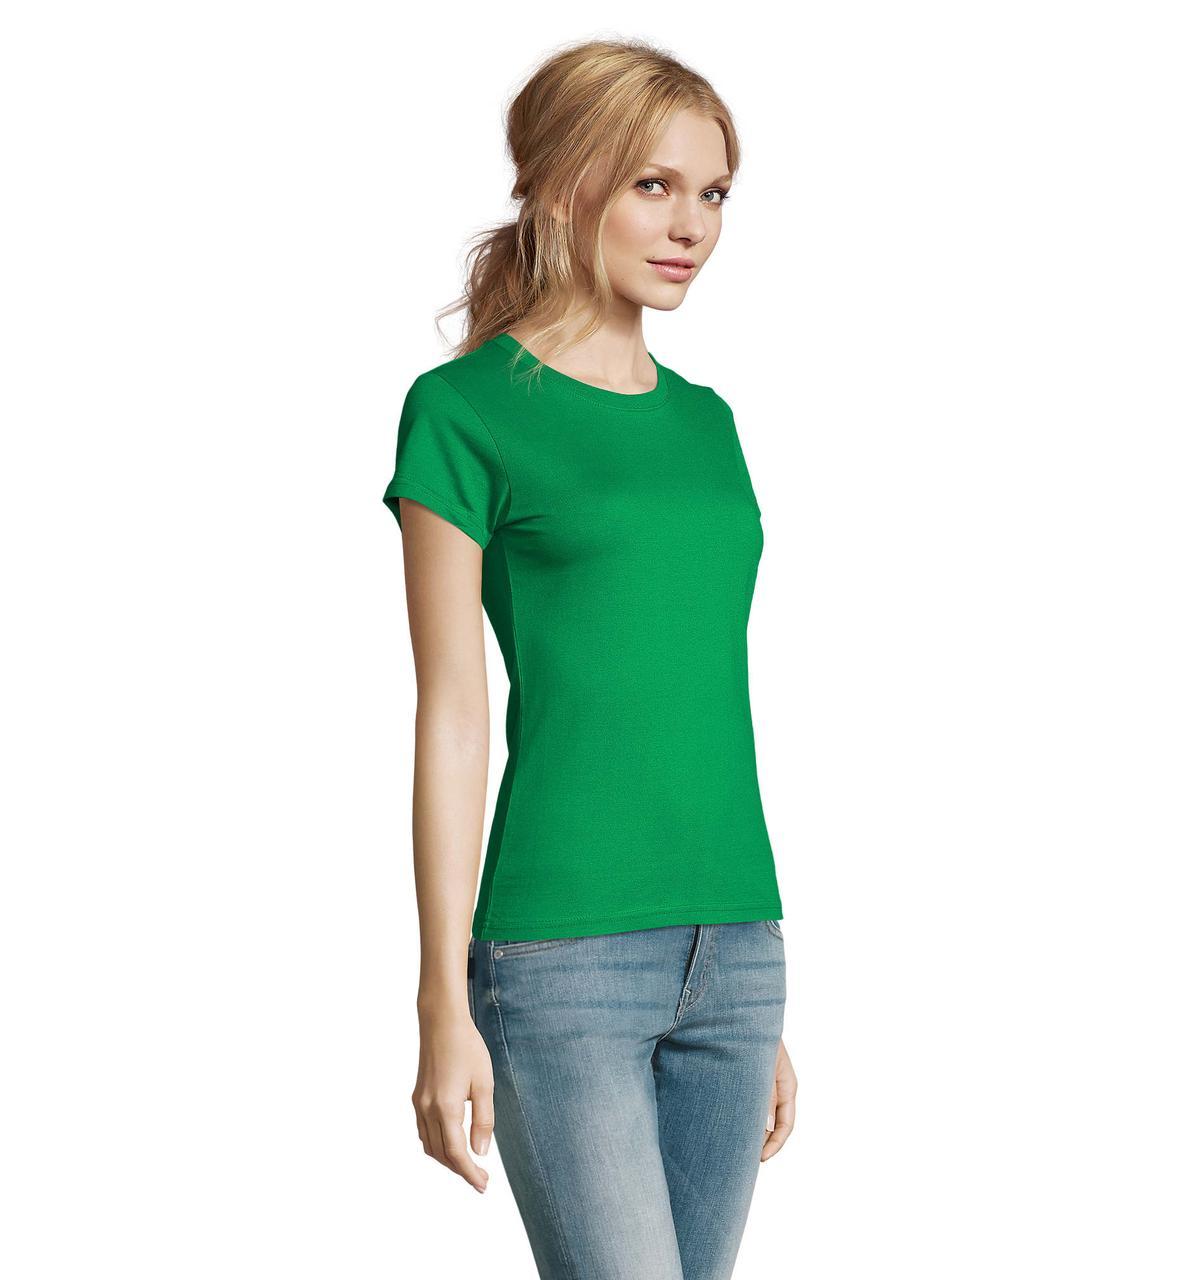 Футболка женская Imperial Women, Kelly-green_272, SOL'S, размеры от S до 2XL, плотность 190 г/м2